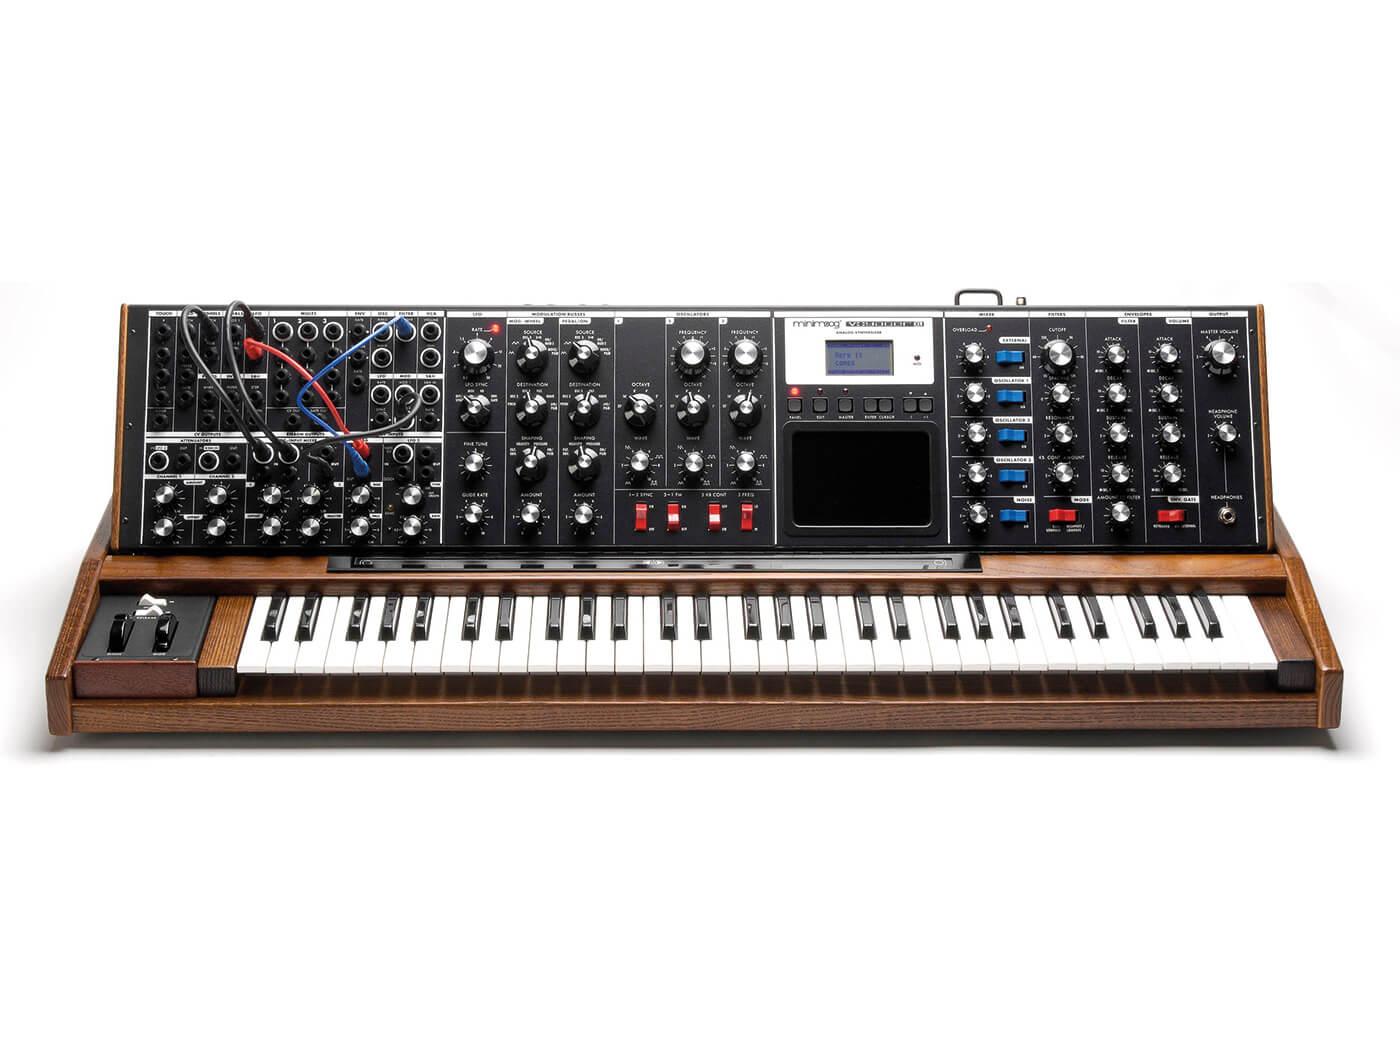 GOTD Moog Minimoog Voyager XL